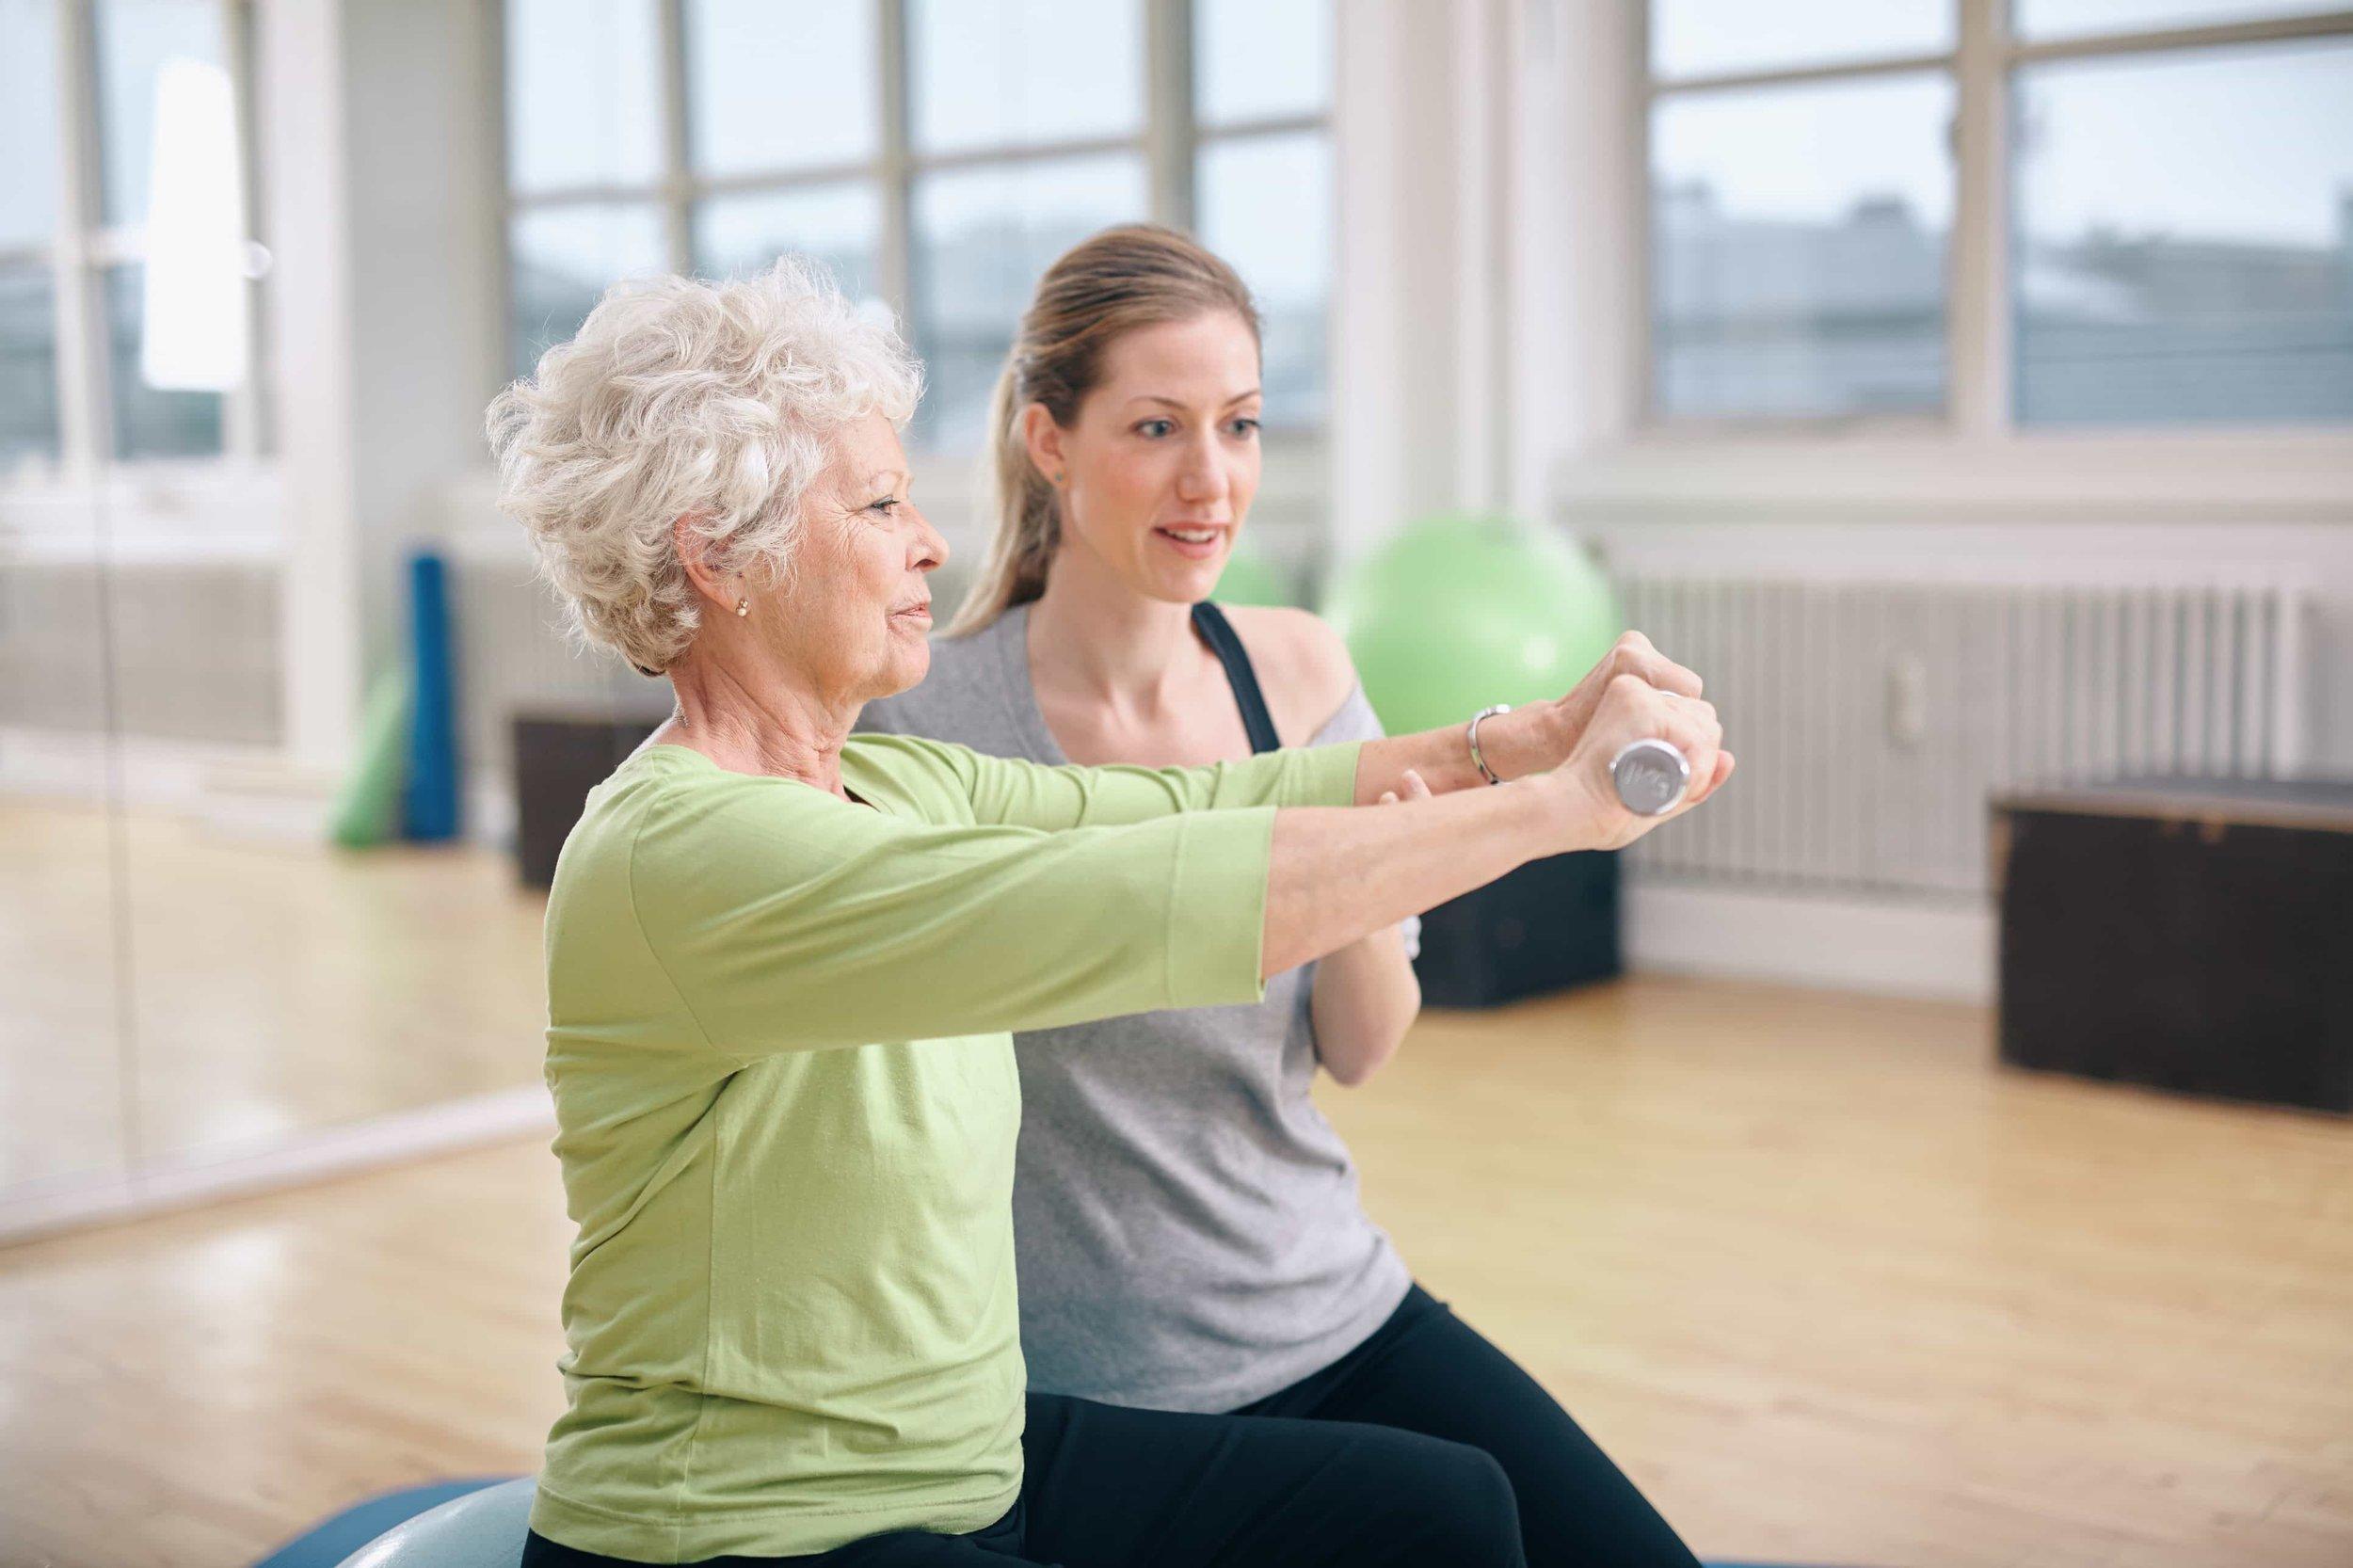 Woman doing post surgery rehab exercises